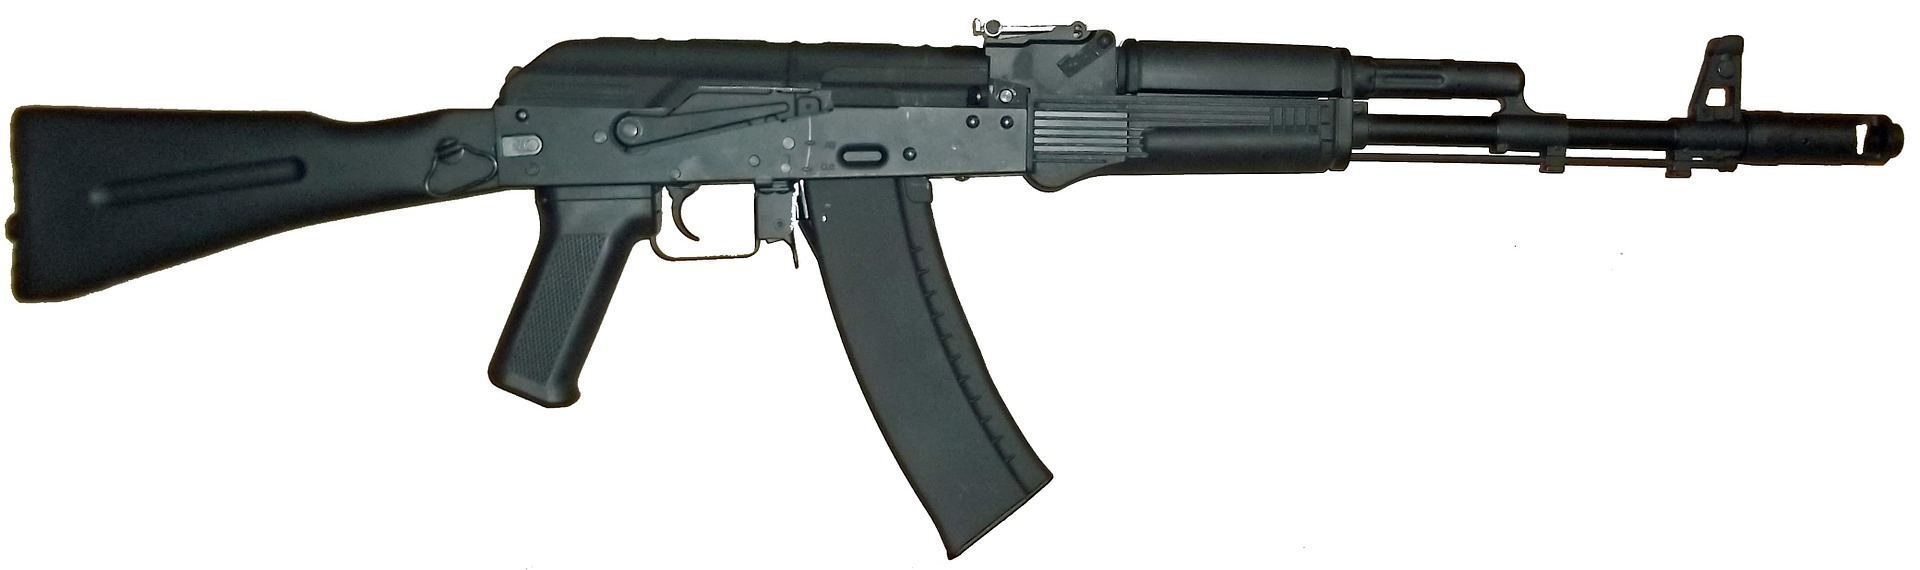 ak-47-872500_1920